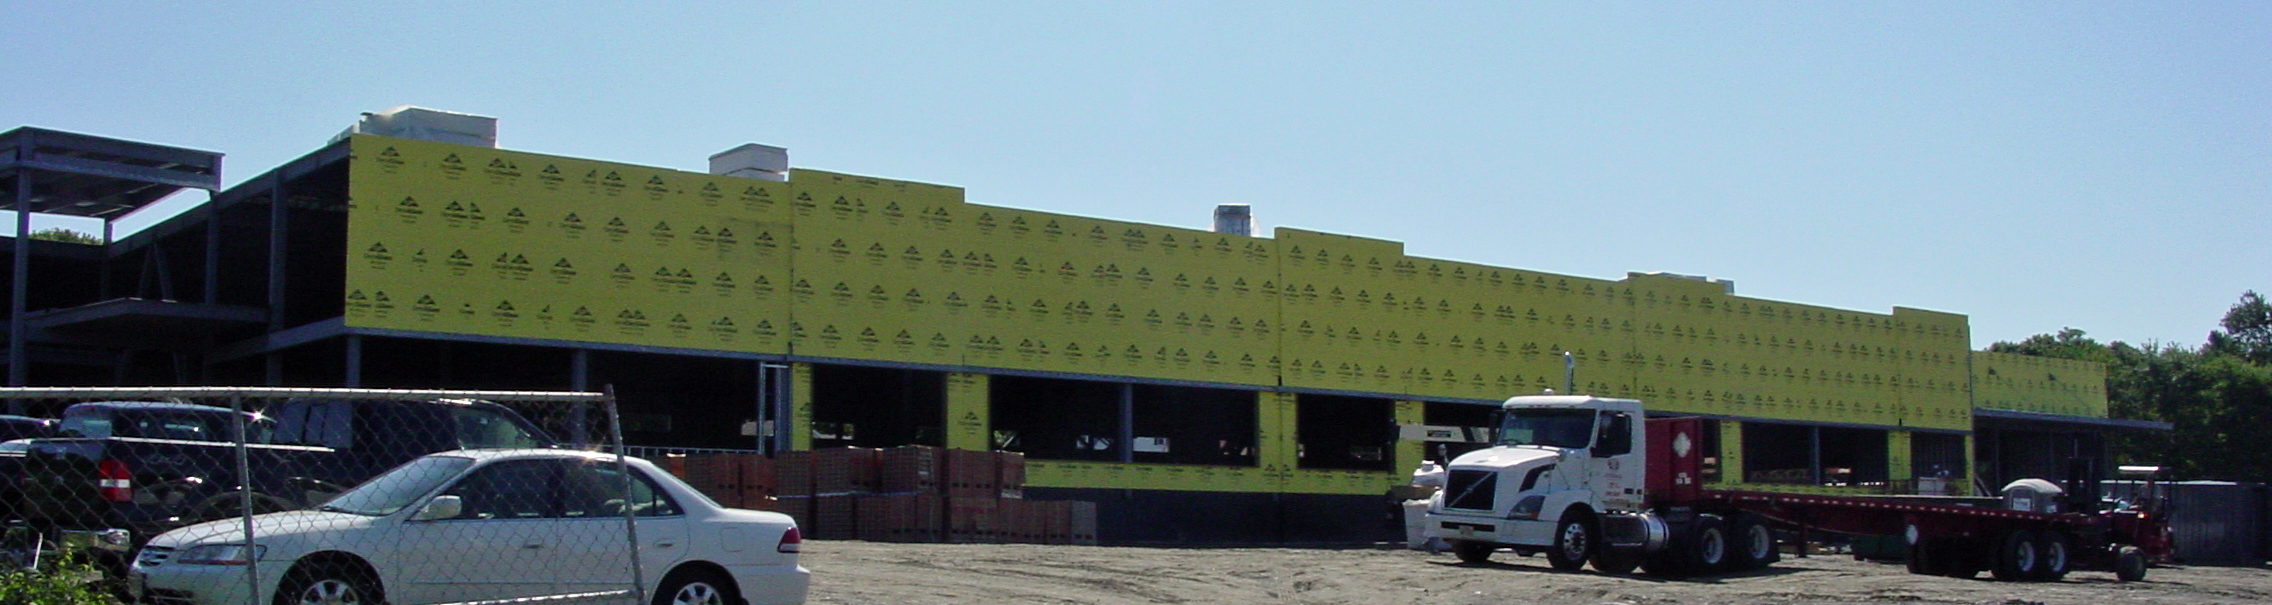 Building facade, August 17, 2011